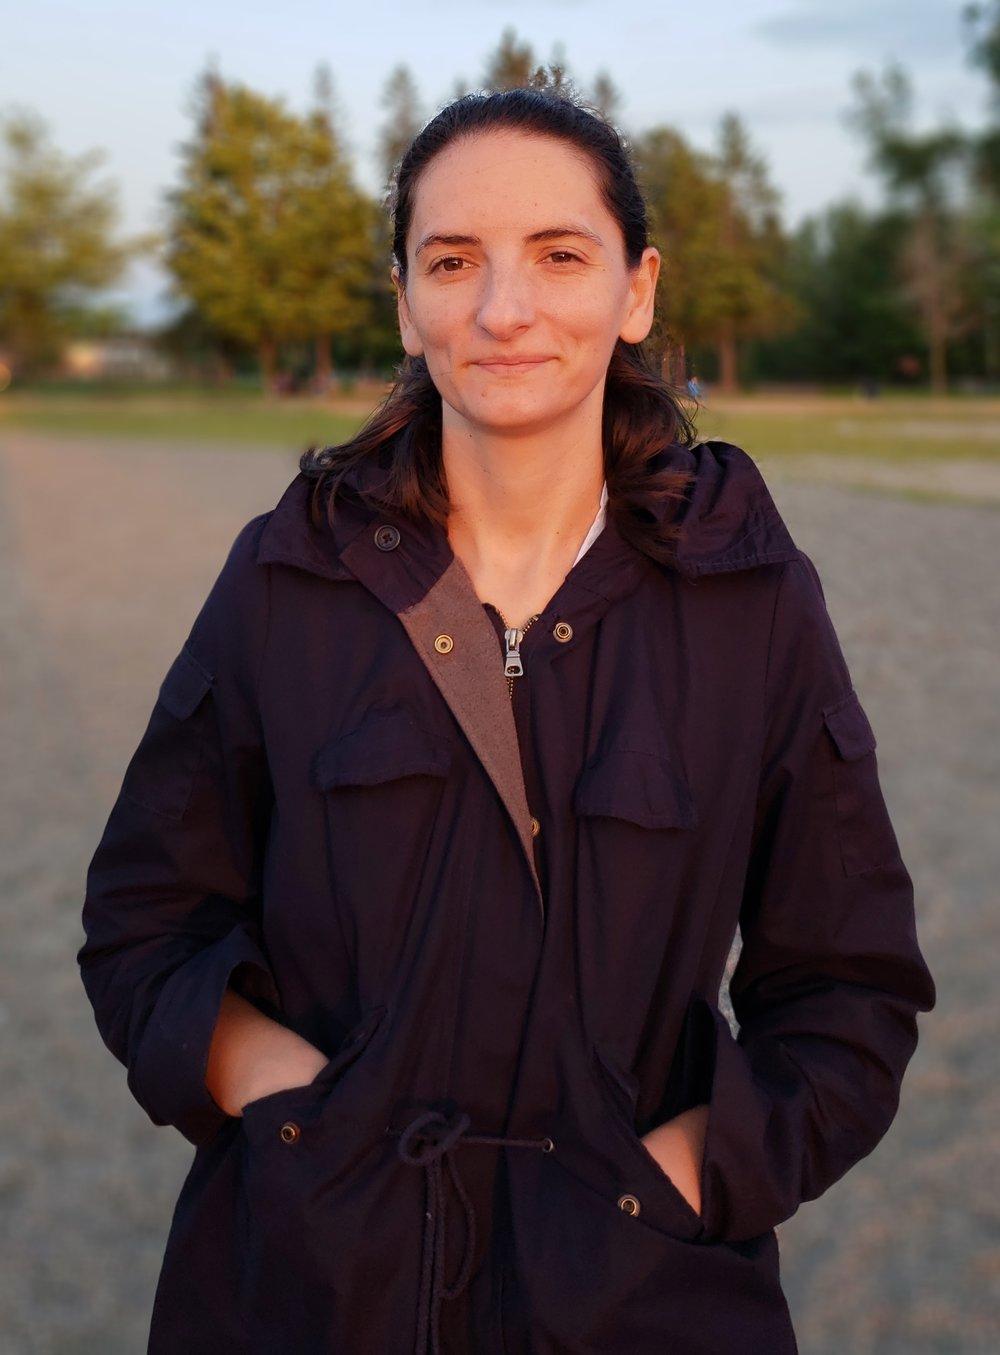 - Suzana P. GelovaPh.D. in Biology(Katholieke Universiteit Leuven, Belgium, 2014)